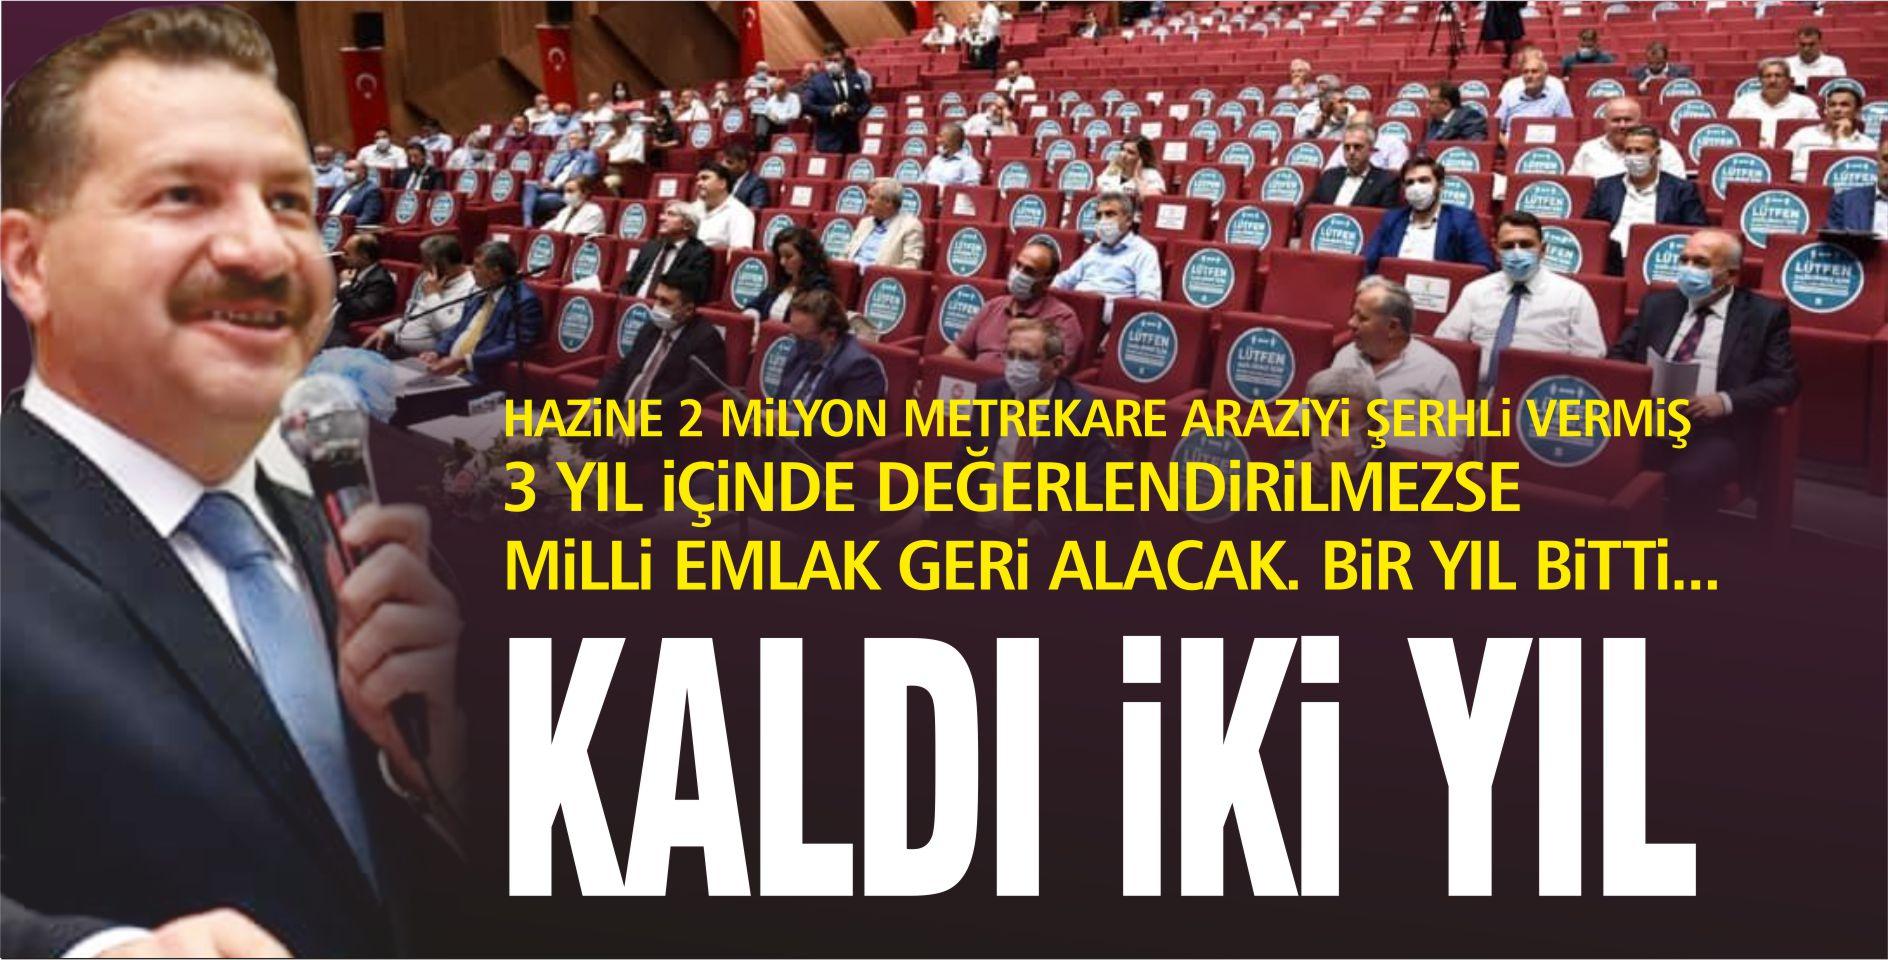 KALDI İKİ YIL!